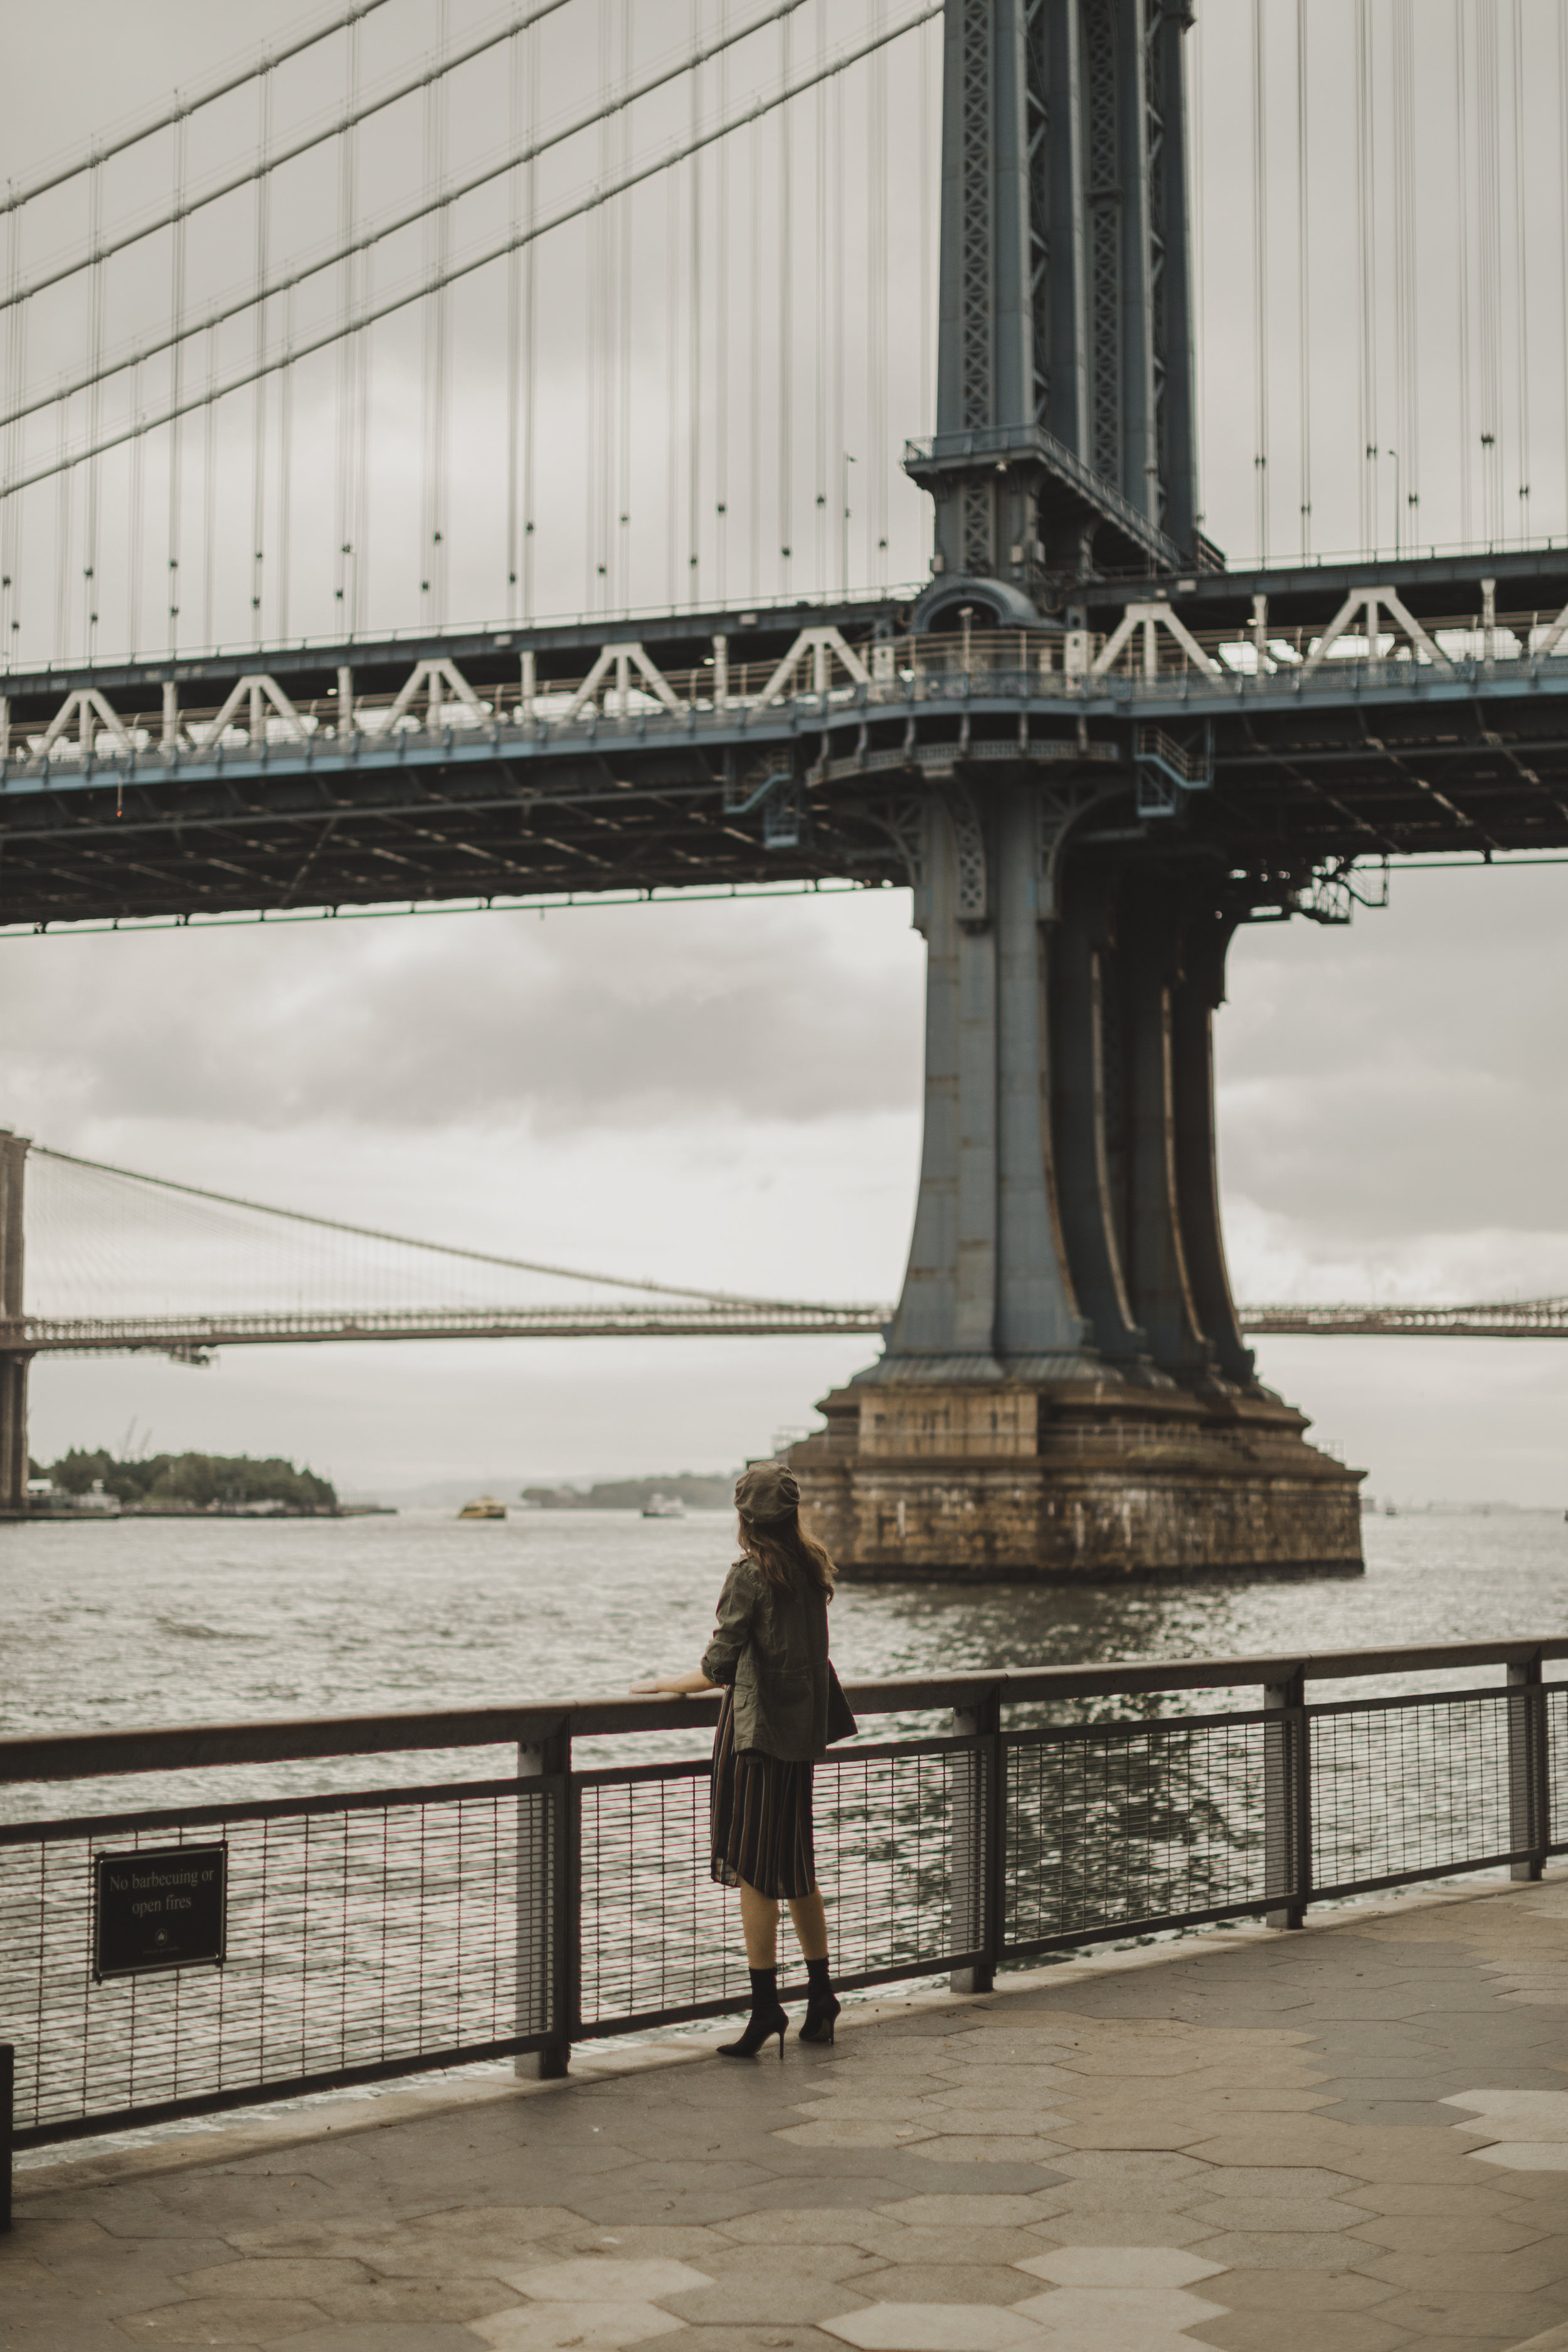 ALIX_NYC_ANTHRO_01.jpg